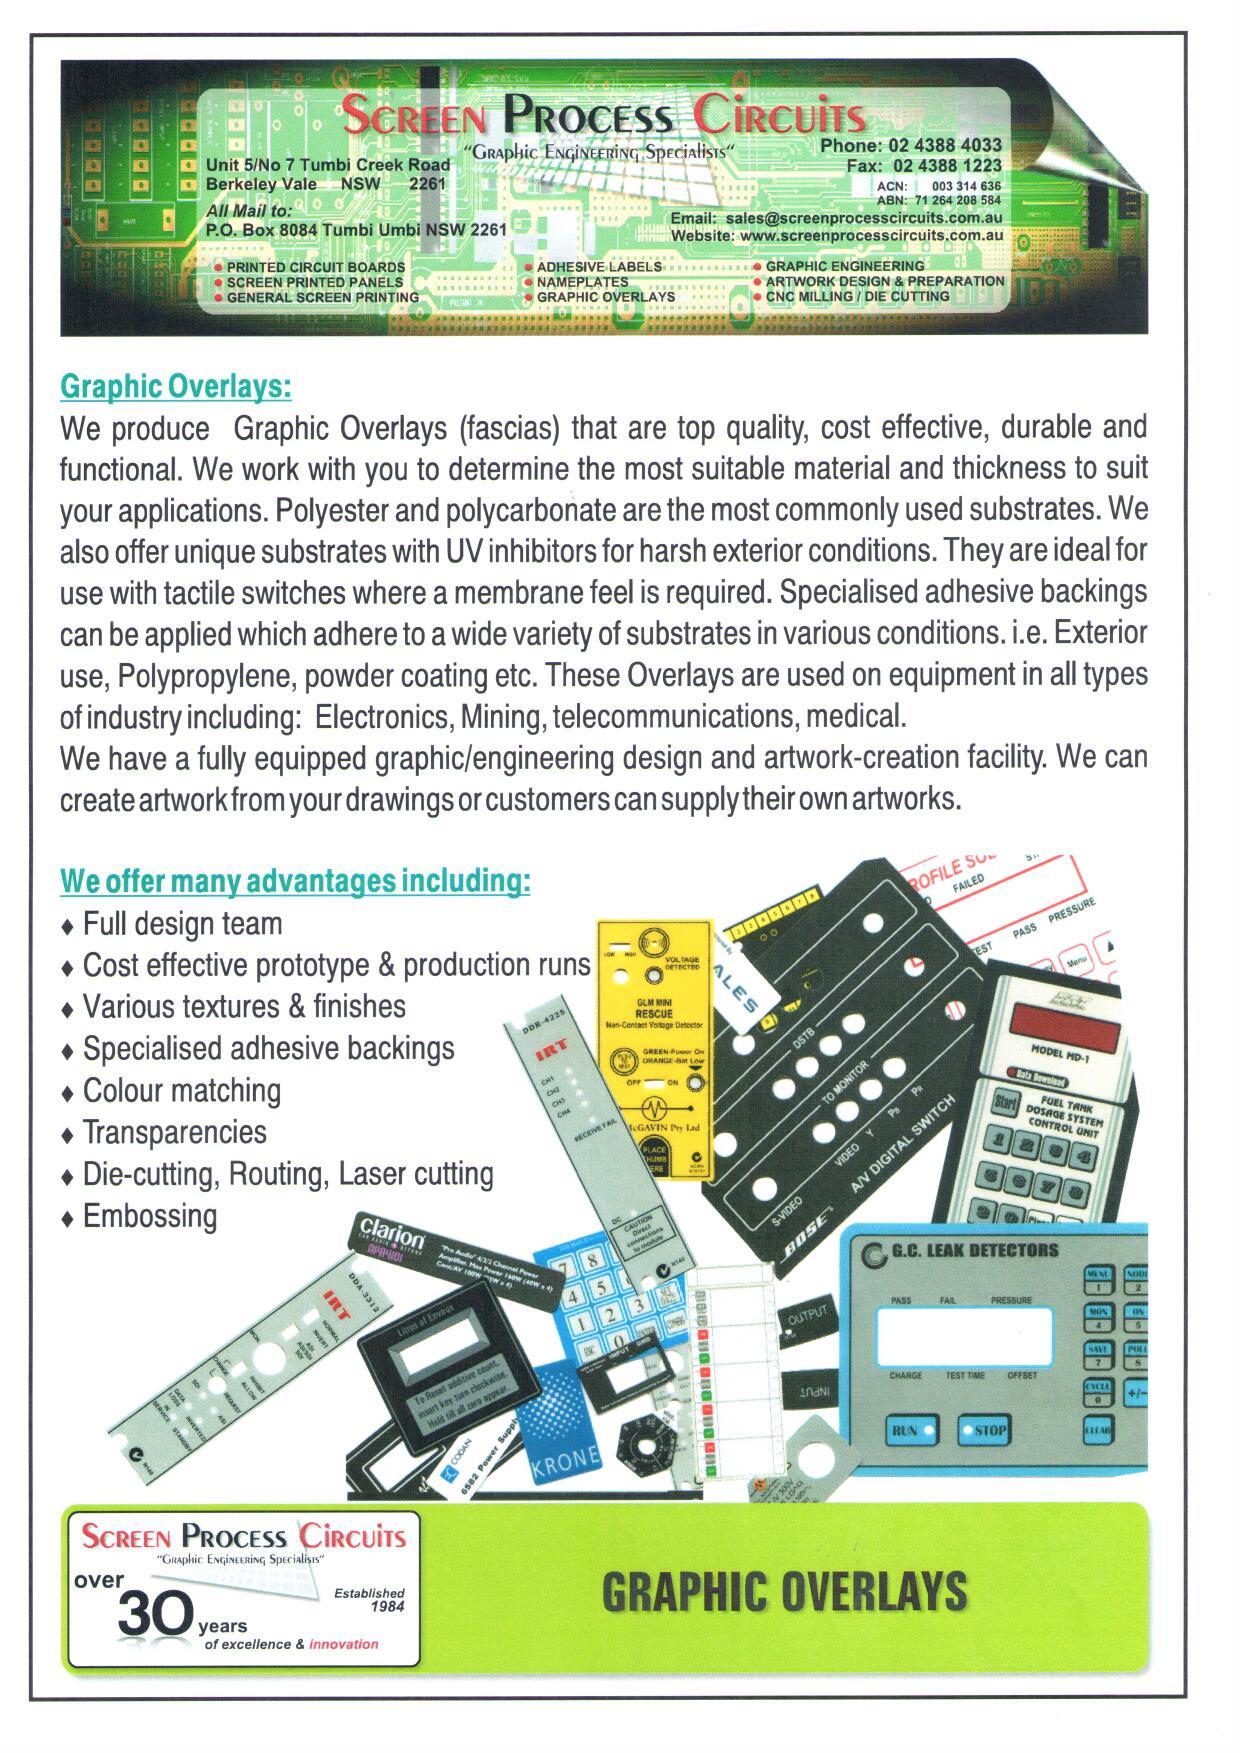 Screen Process Circuits - Screen Printers - Unit 5 7 Tumbi Creek Rd